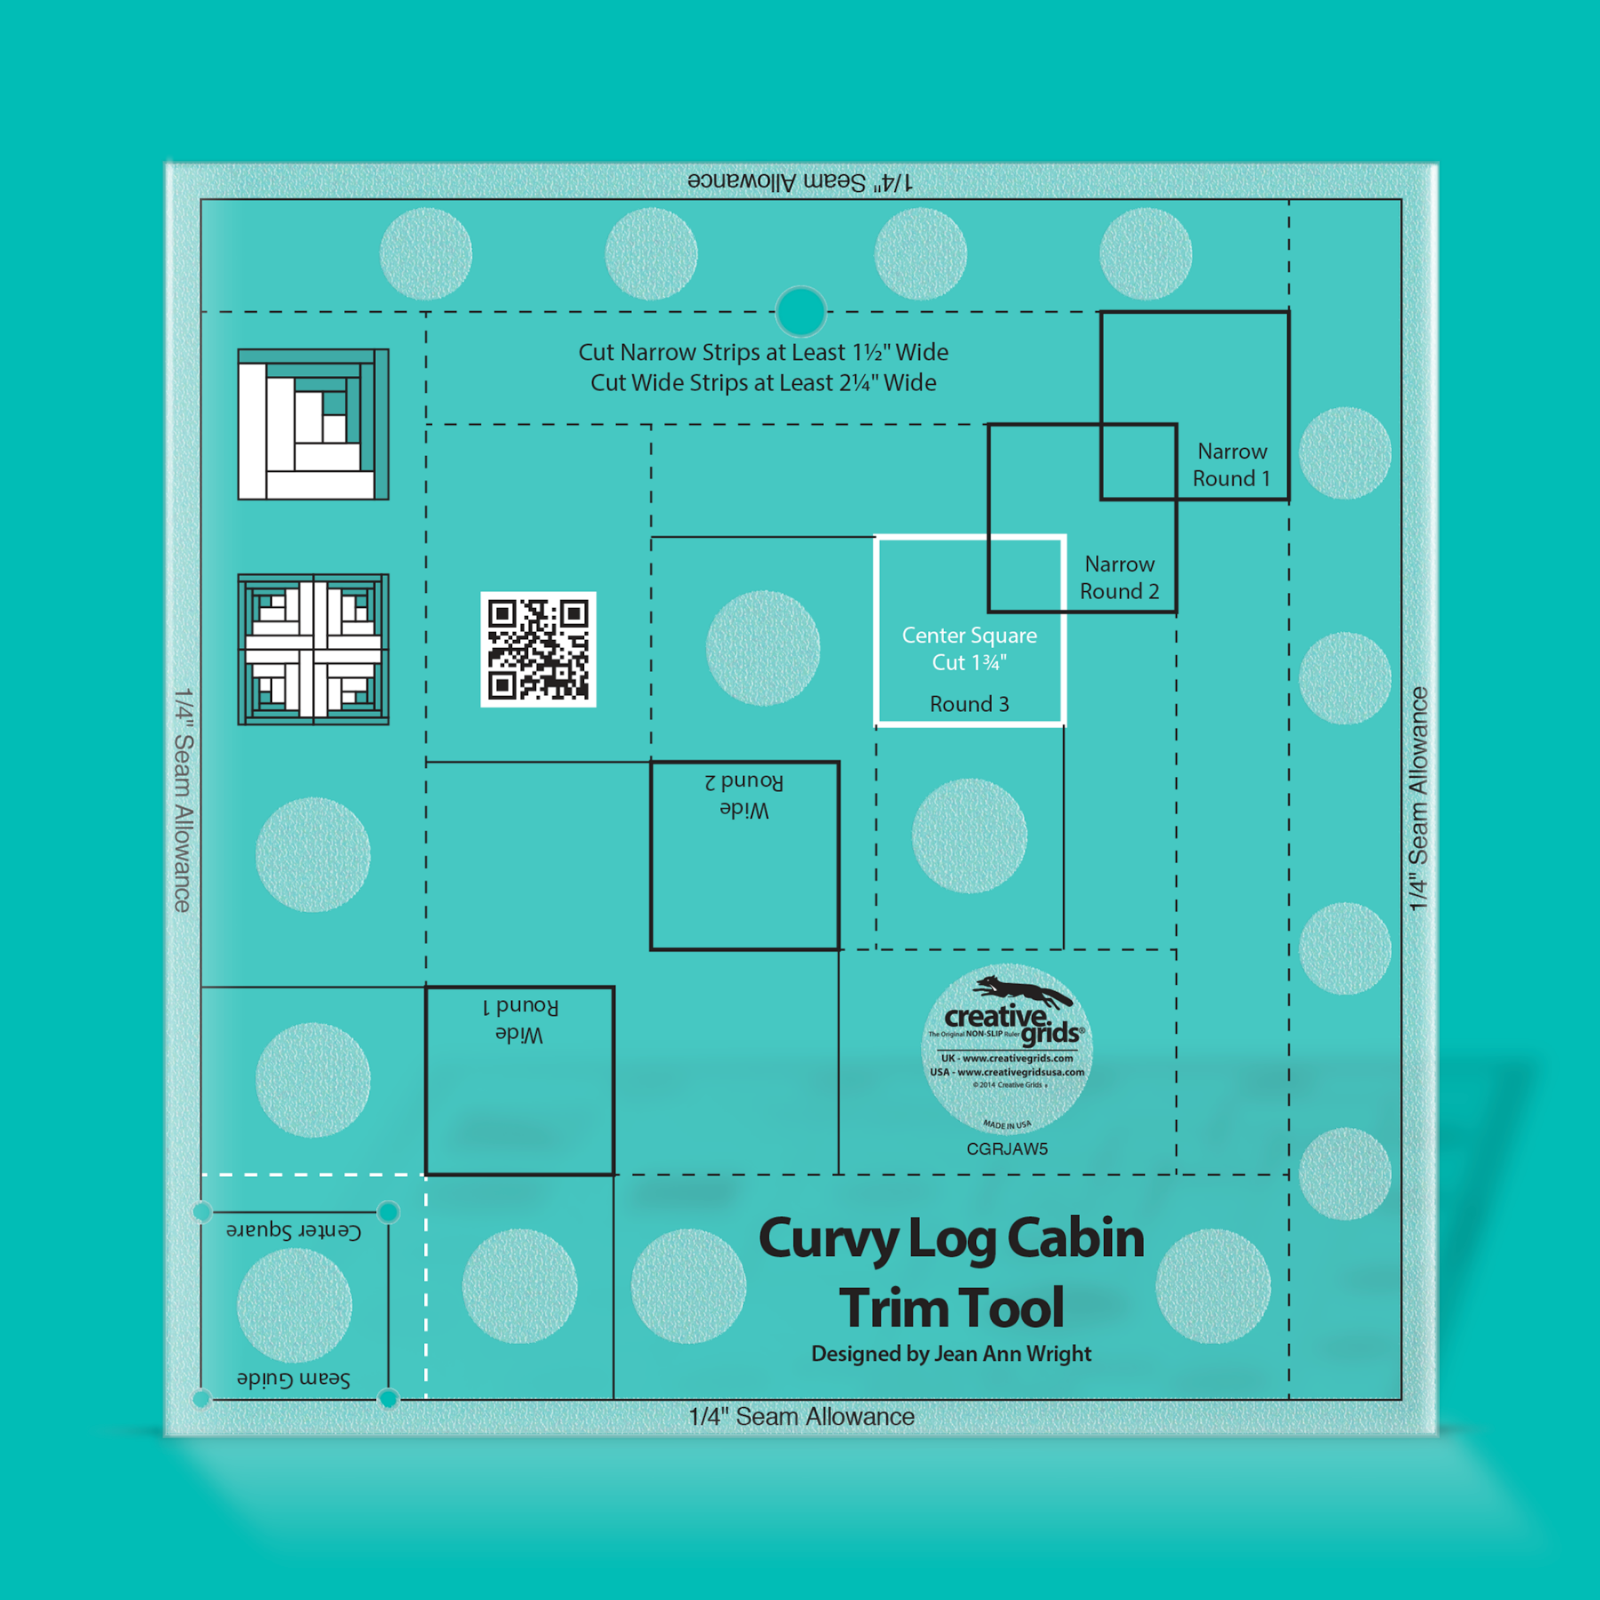 Creative Grids Non-Slip CGRJAW5 - 8 Curvy Log Cabin Trim Tool